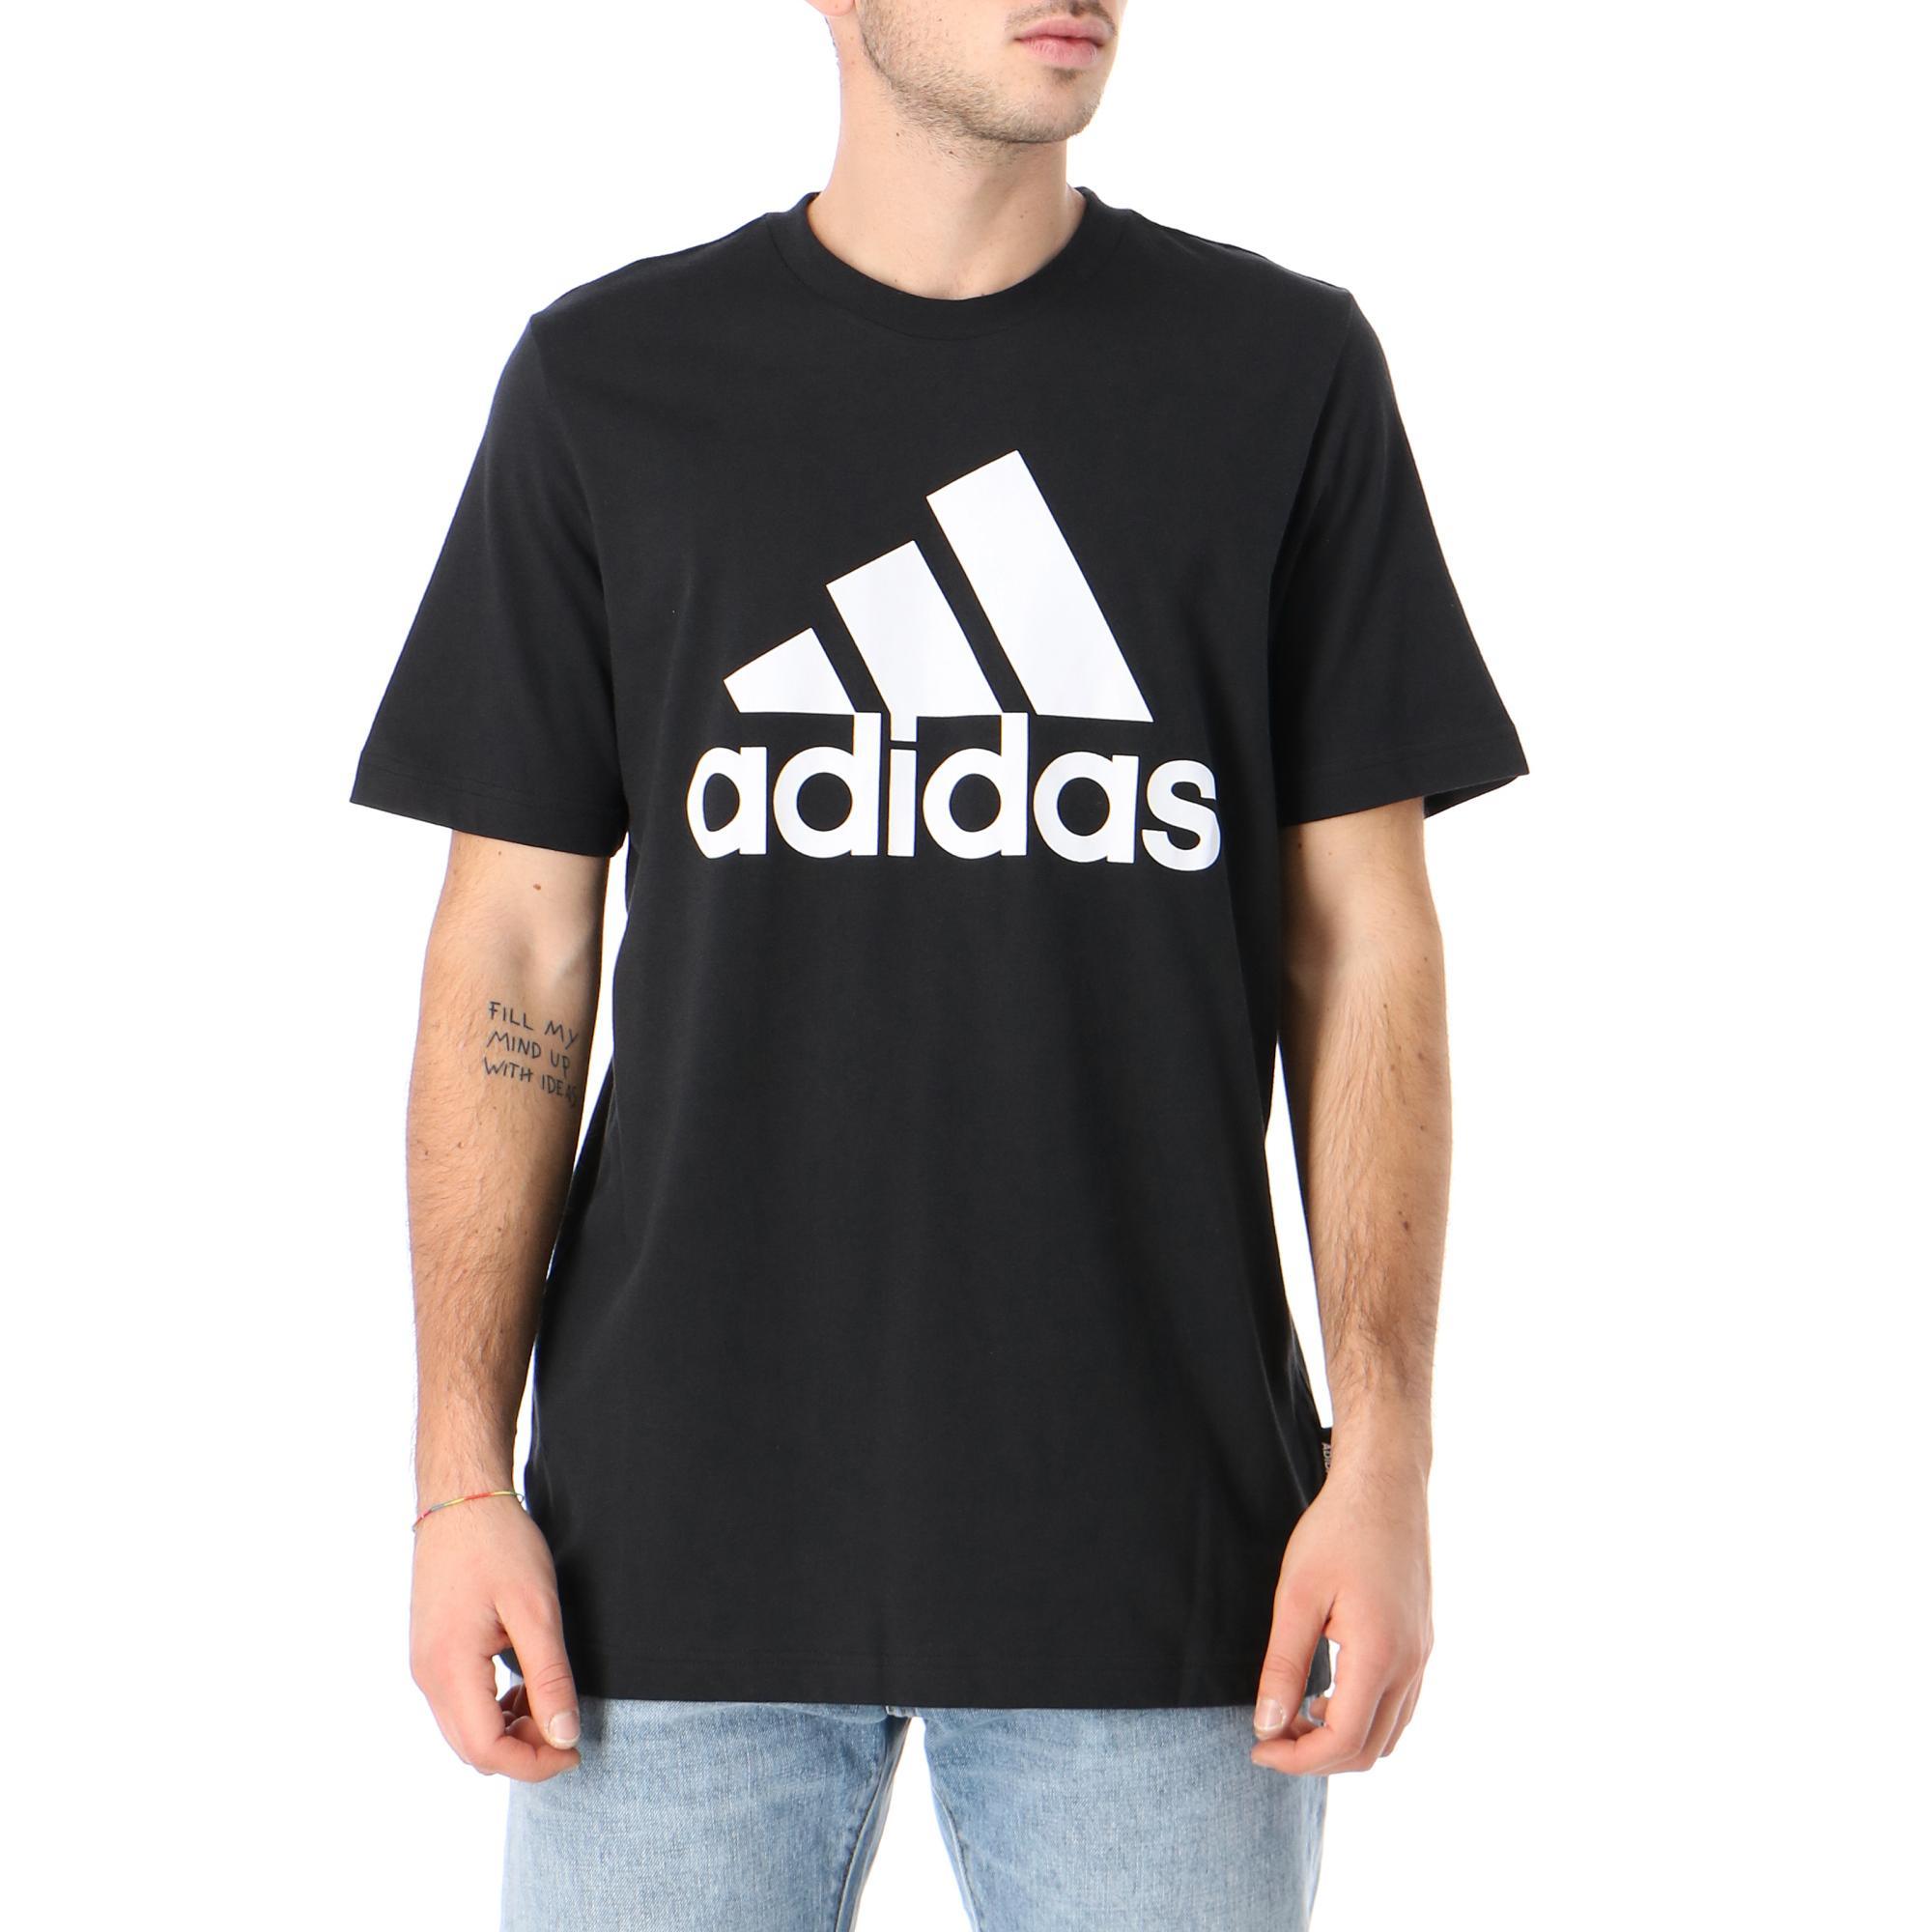 Adidas Mh Bos Tee Black